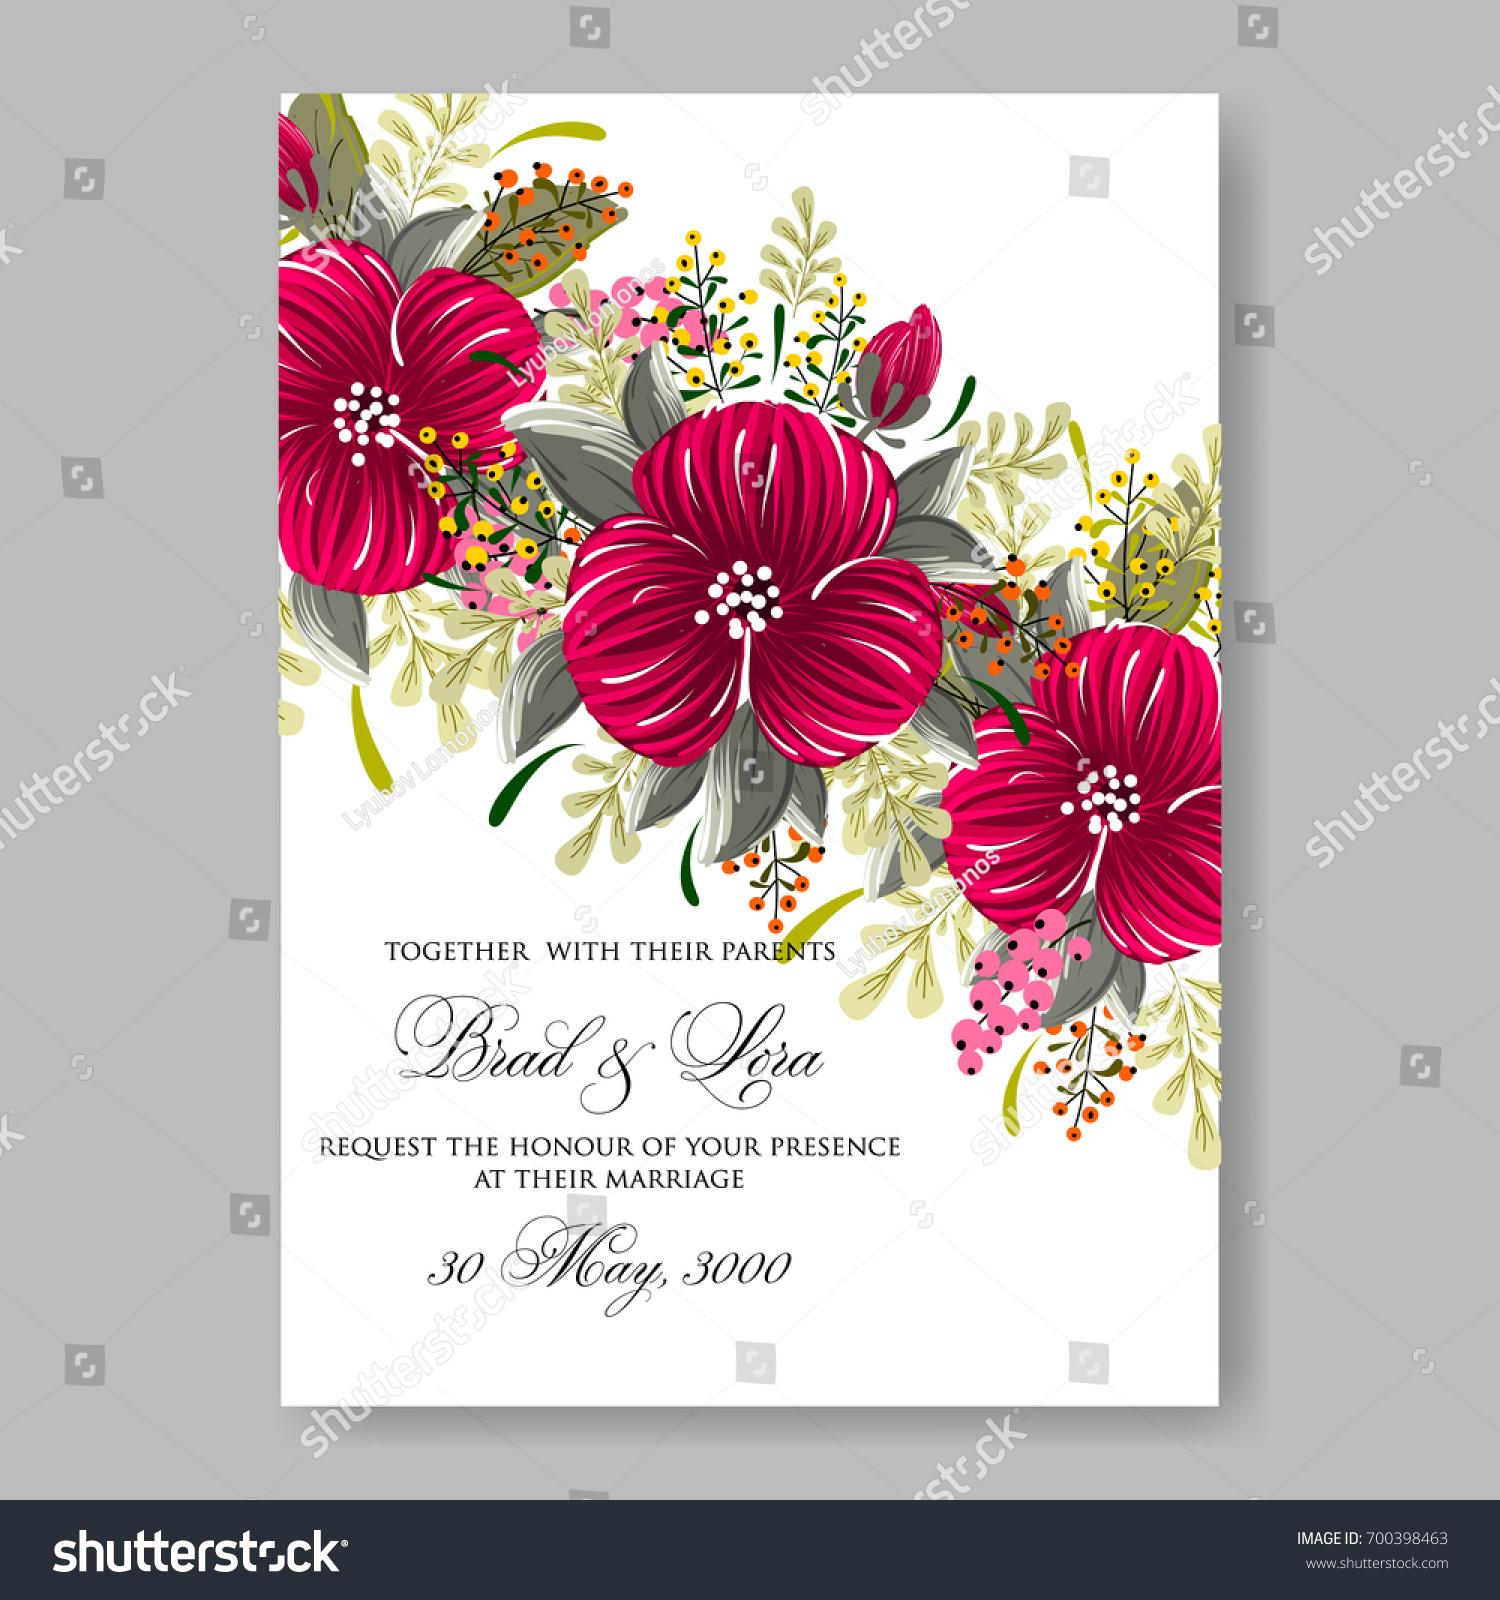 Pink Hibiscus Tropical Flower Wedding Invitation | EZ Canvas